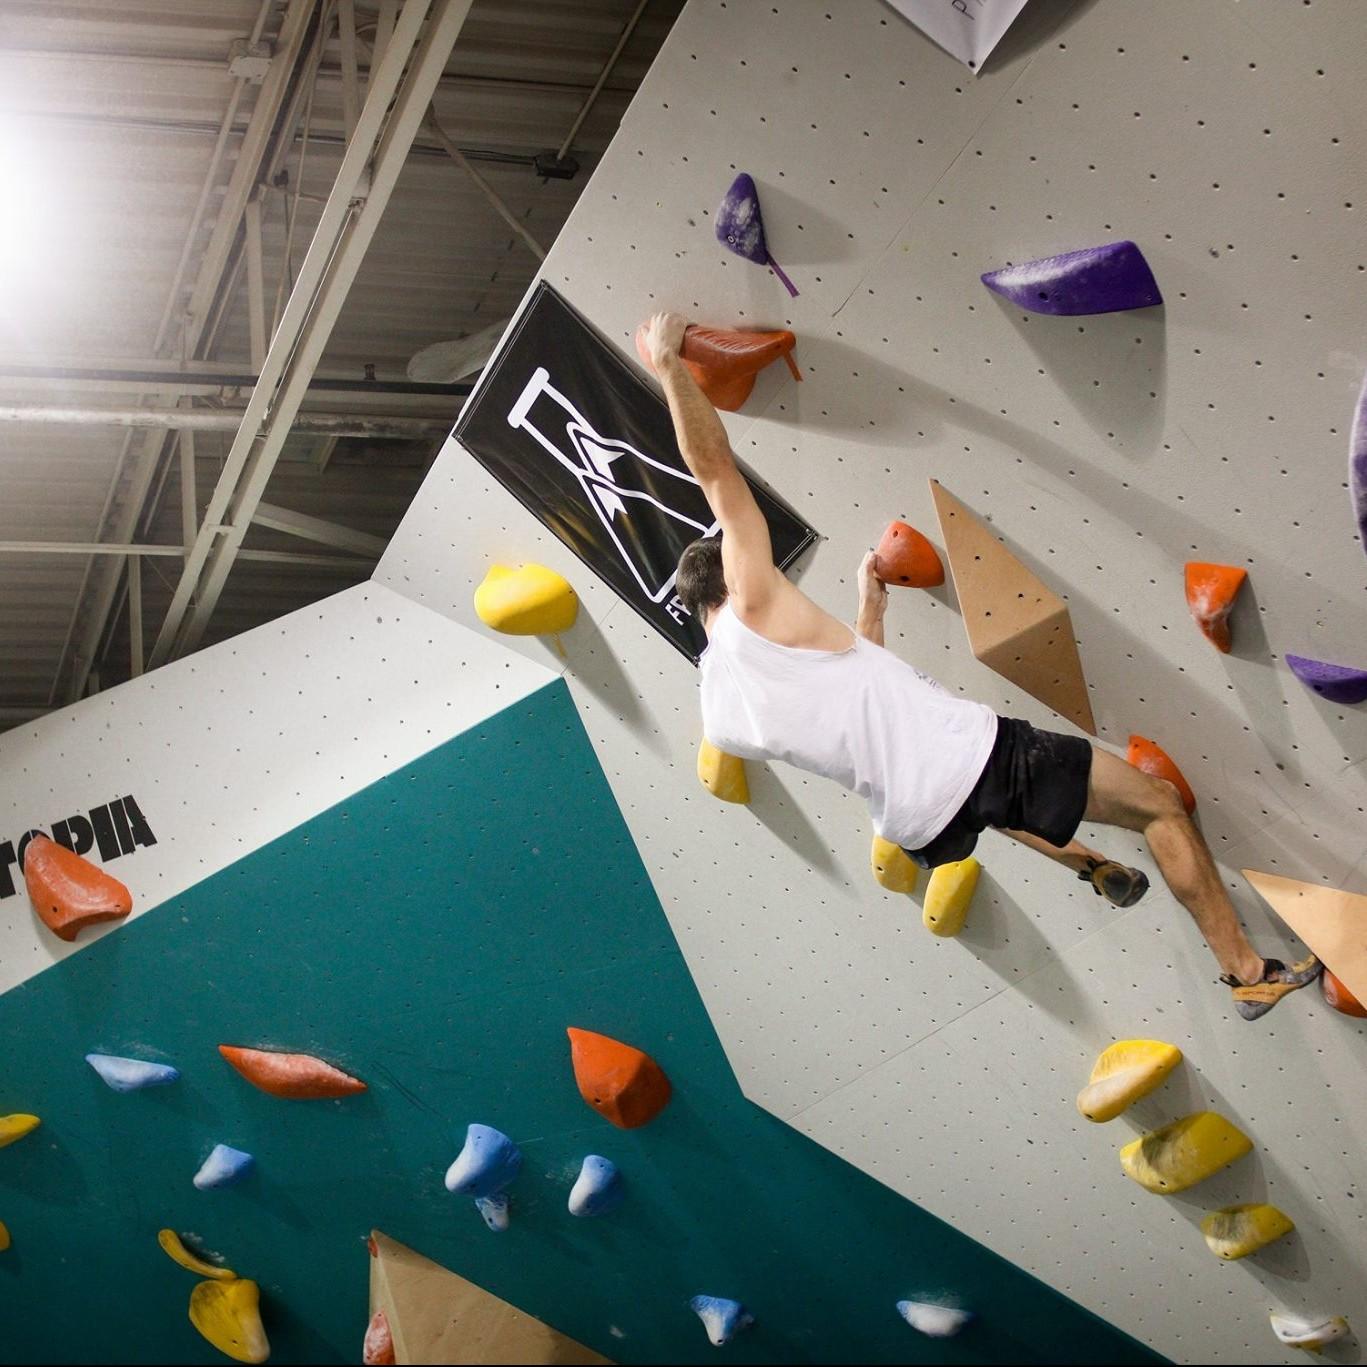 beta bloc montreal bouldering rock climbing (5)